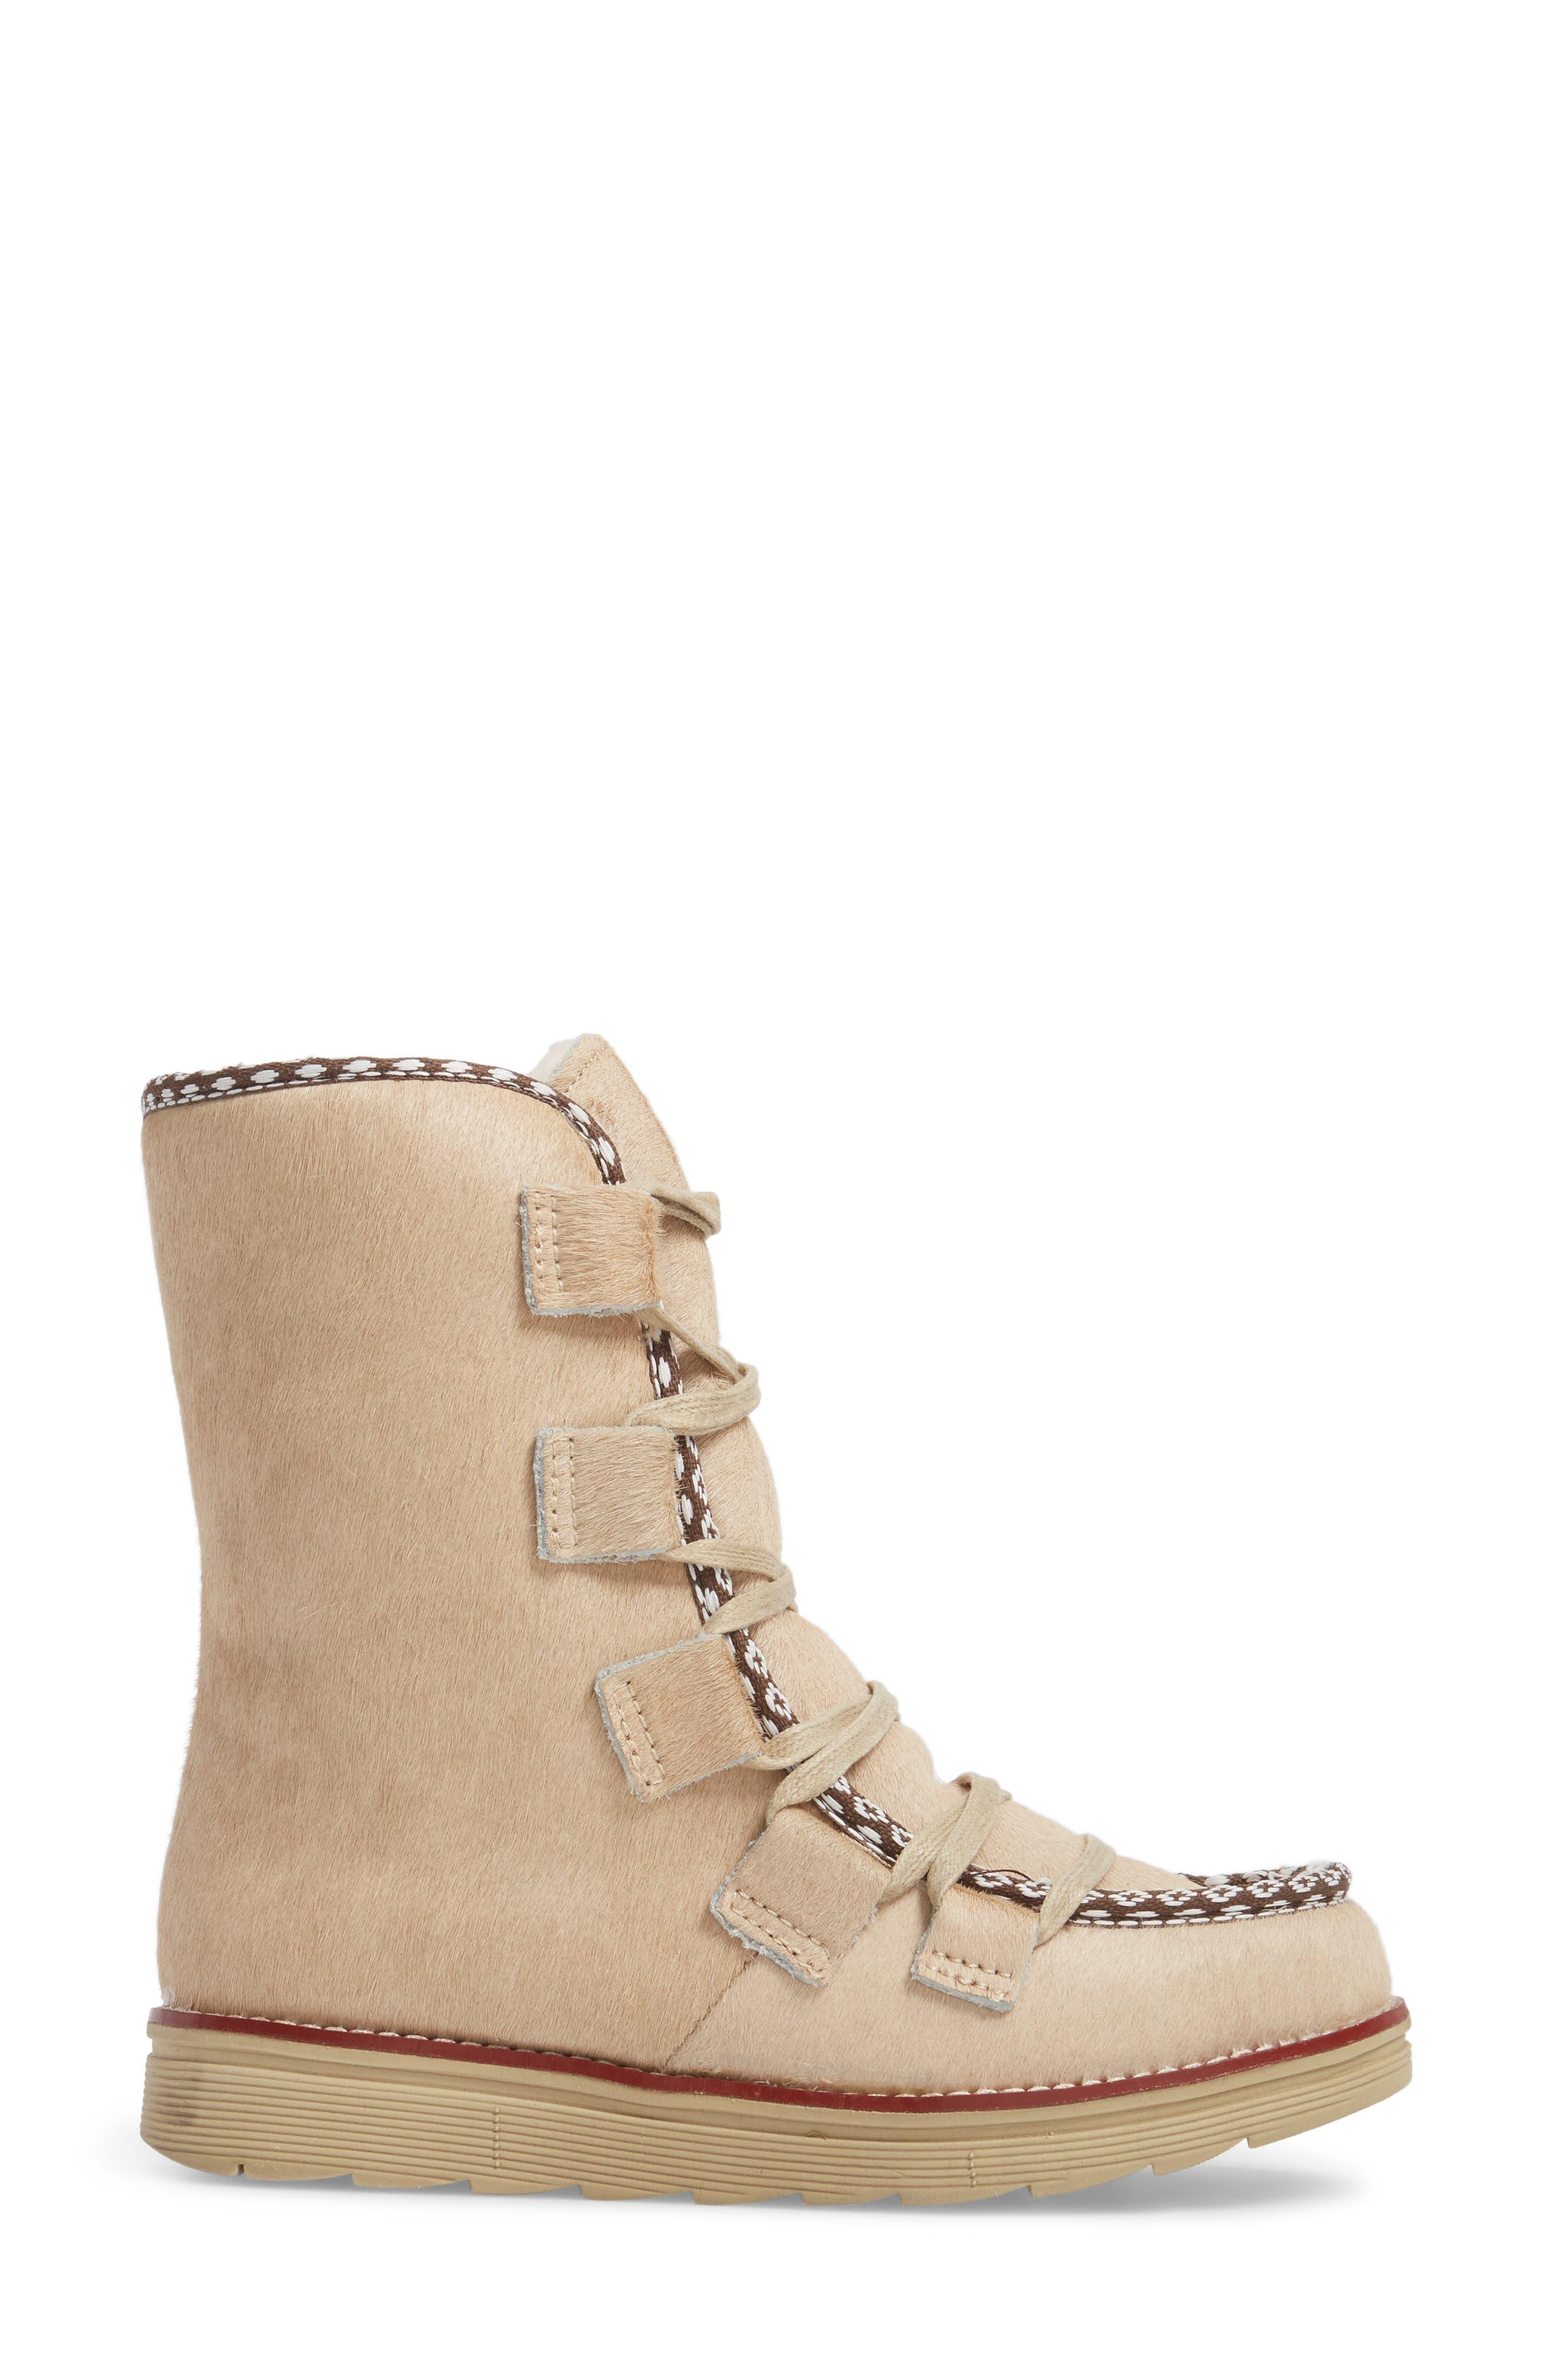 Alternate Image 3  - Royal Canadian Kitchener Waterproof Genuine Calf Hair Snow Boot (Women)